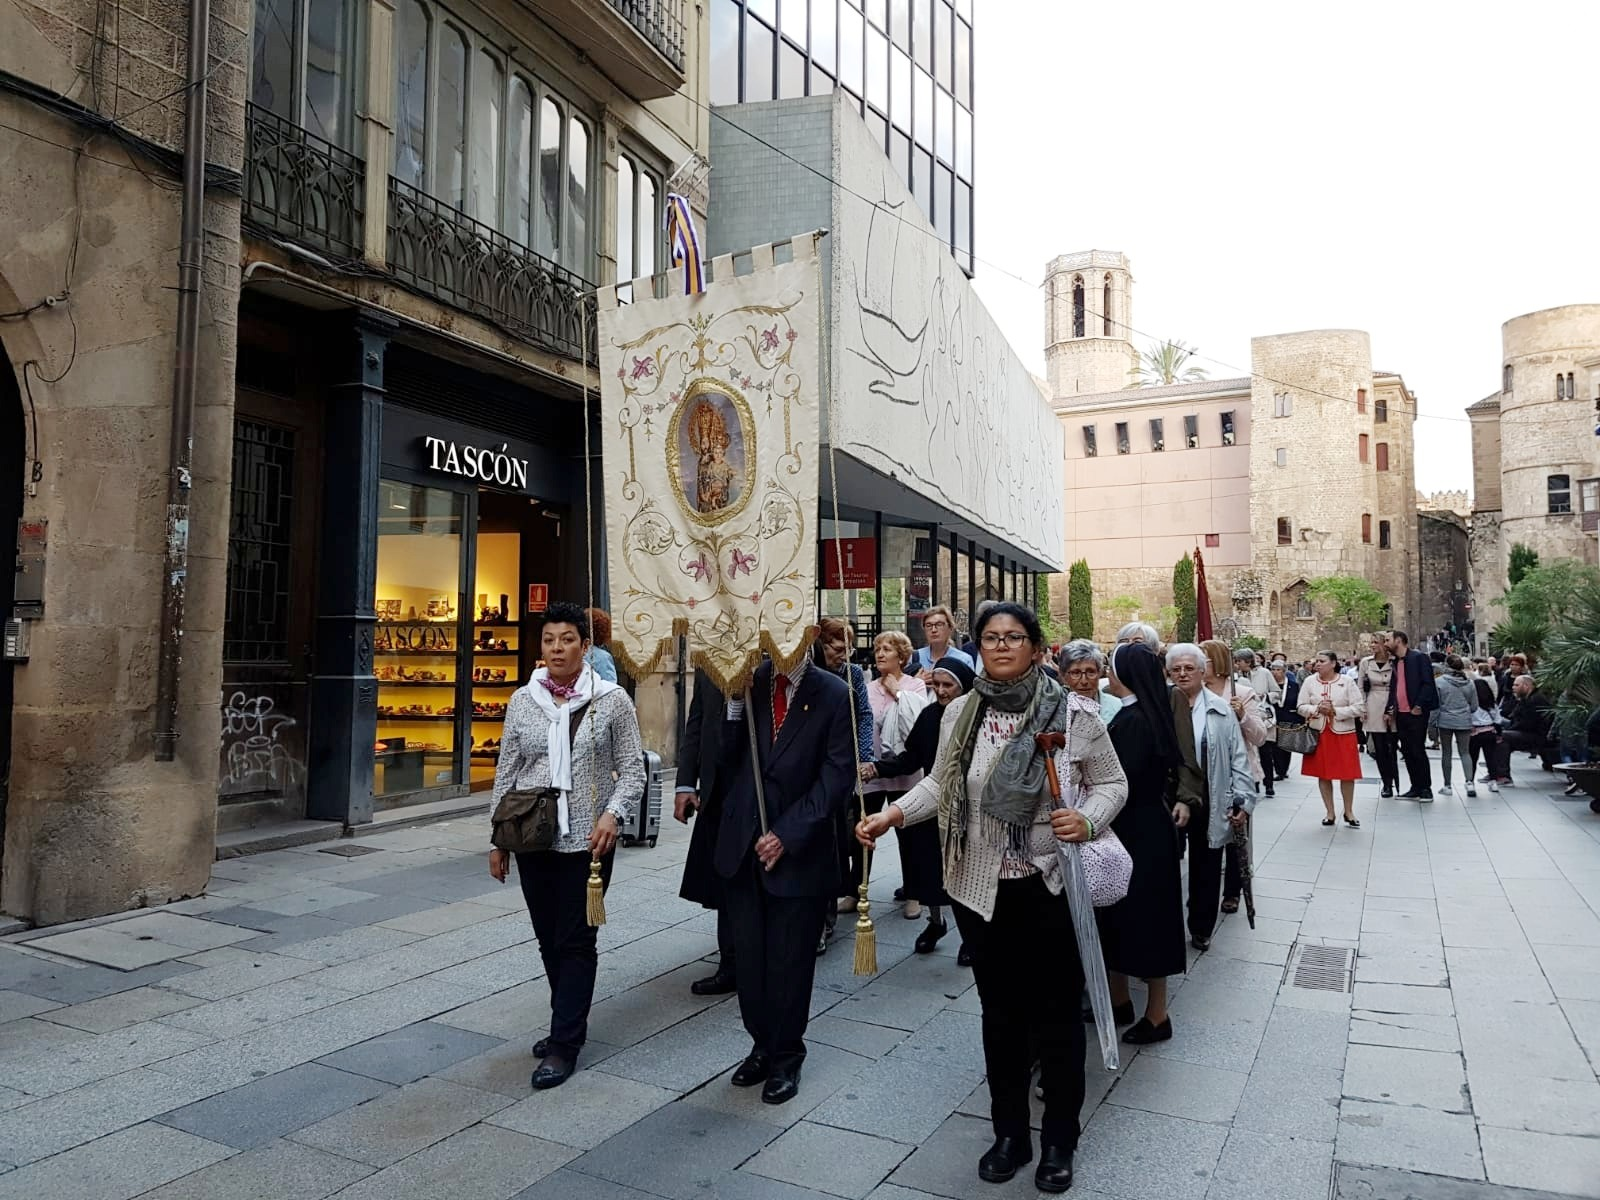 asociacion san jose en barcelona procesion